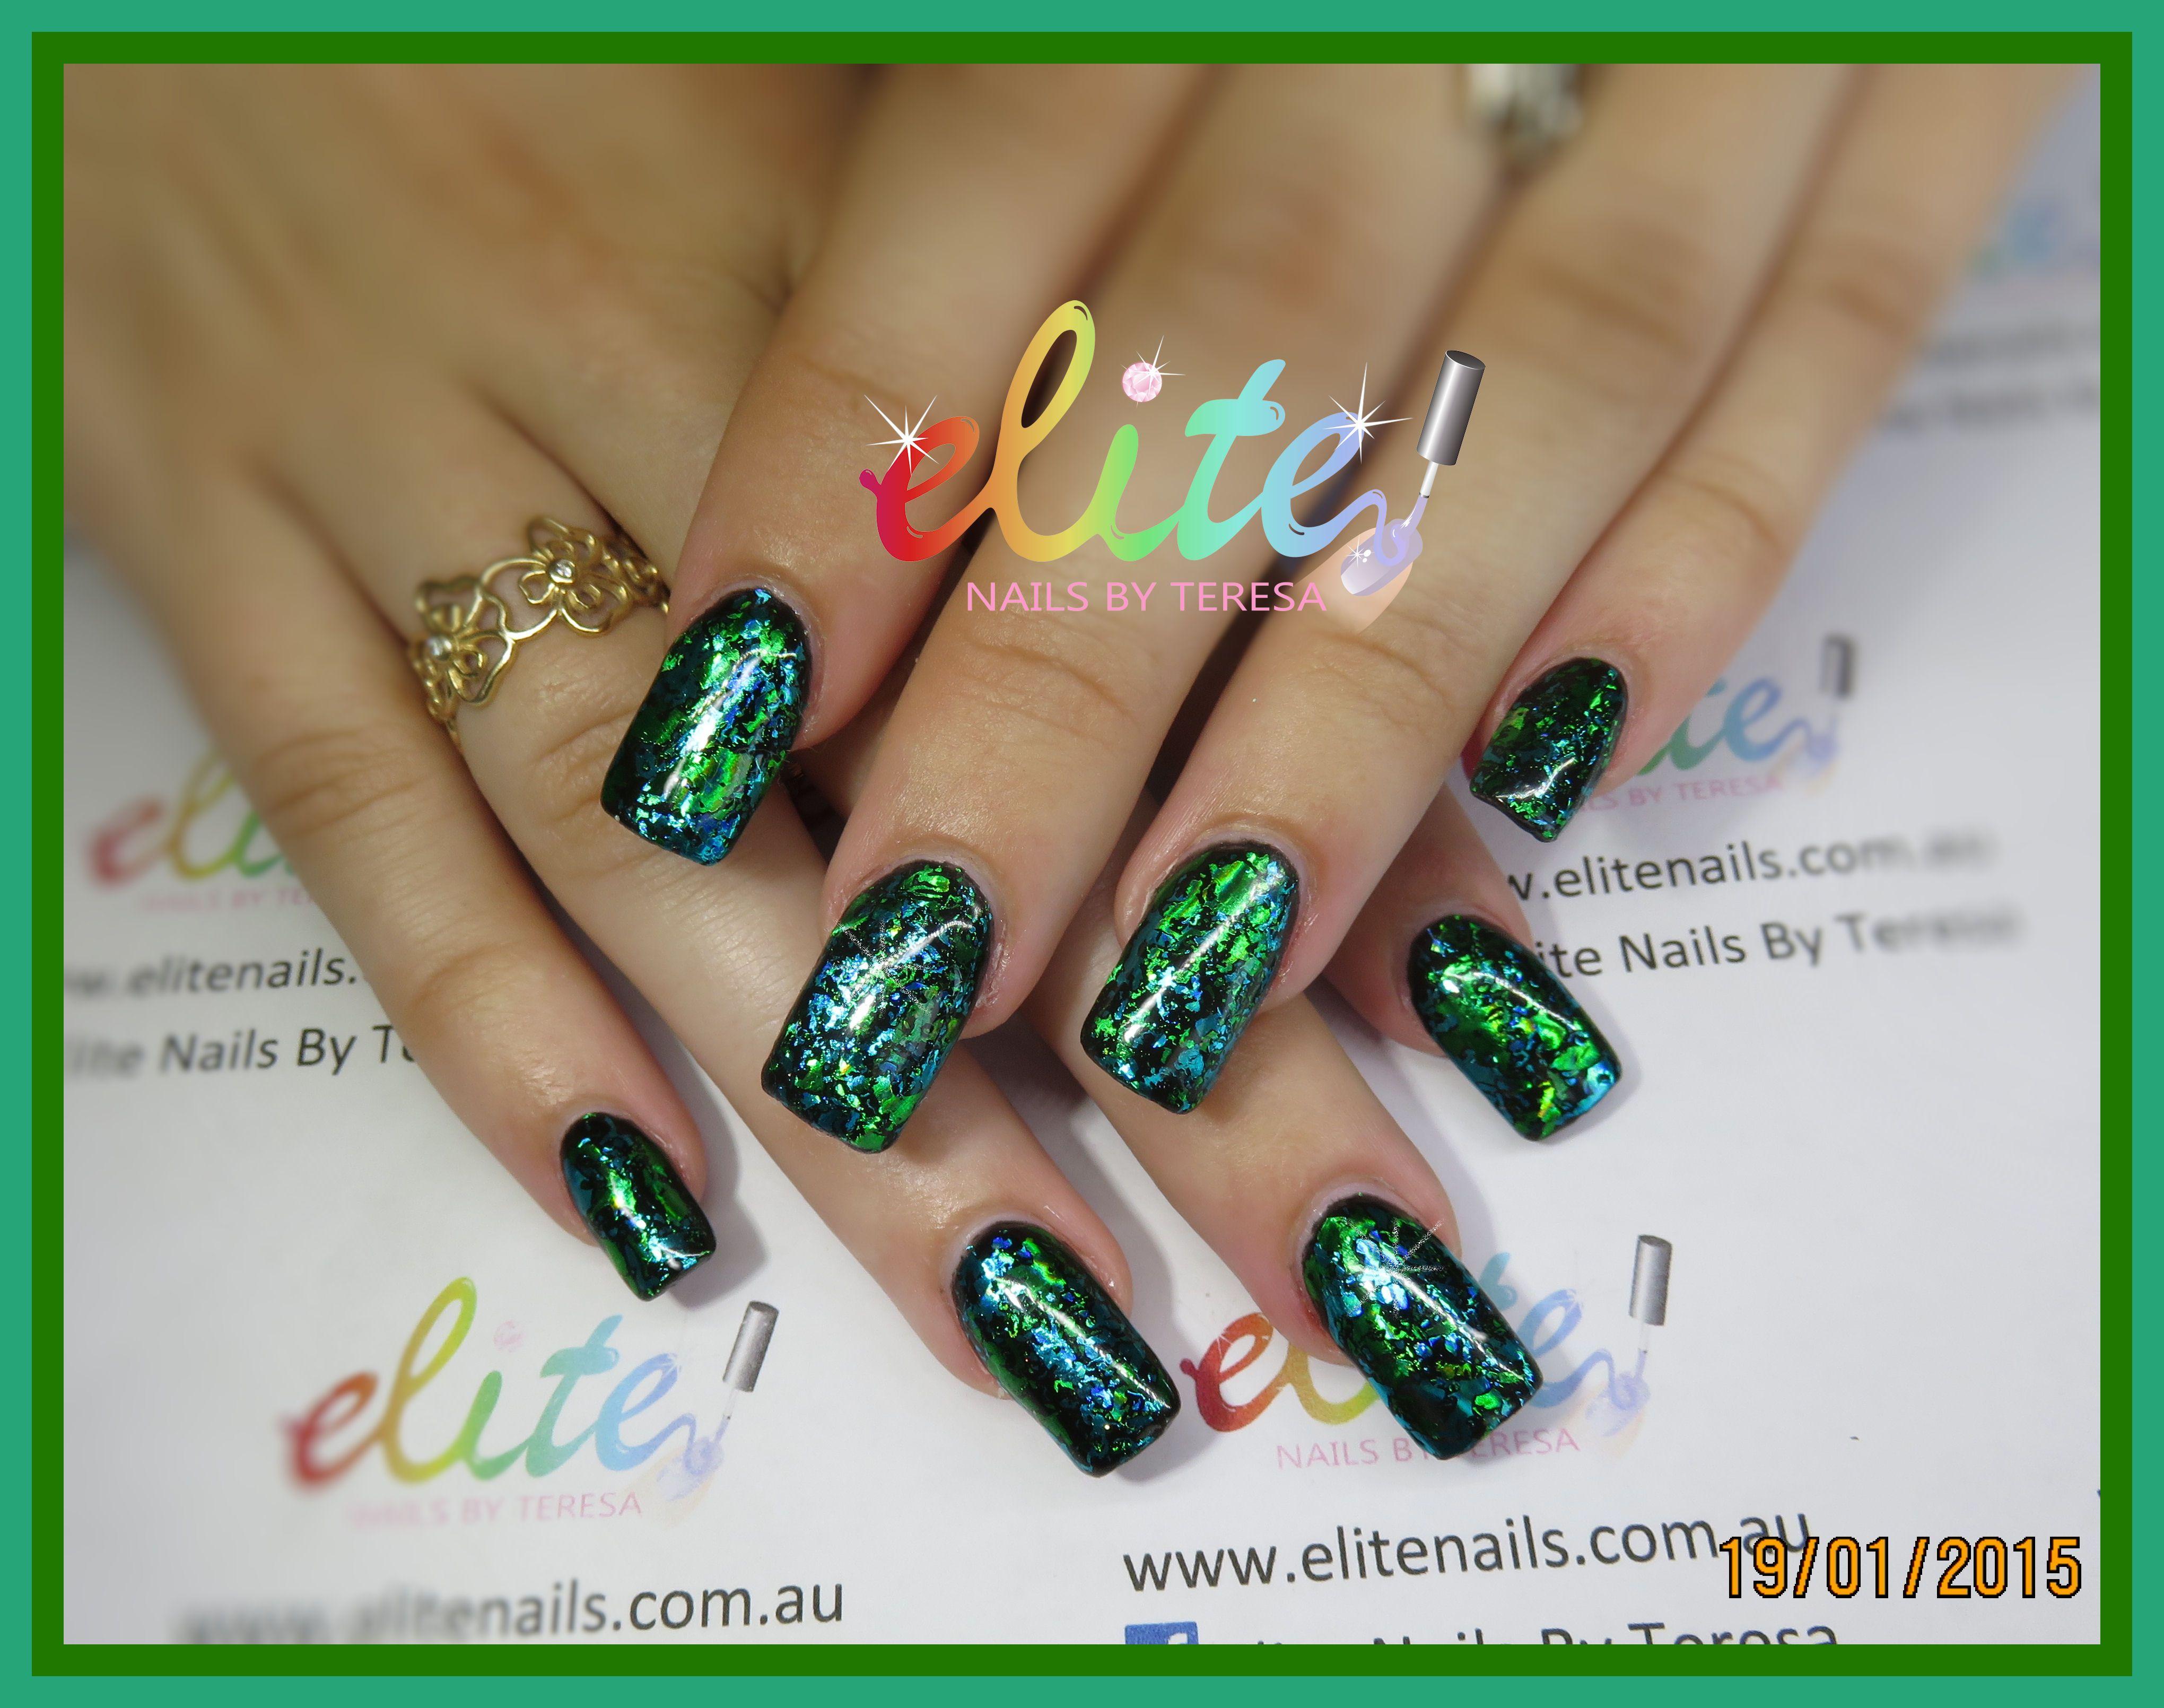 Fine Elite Nails Acworth Pictures - Nail Art Ideas - morihati.com